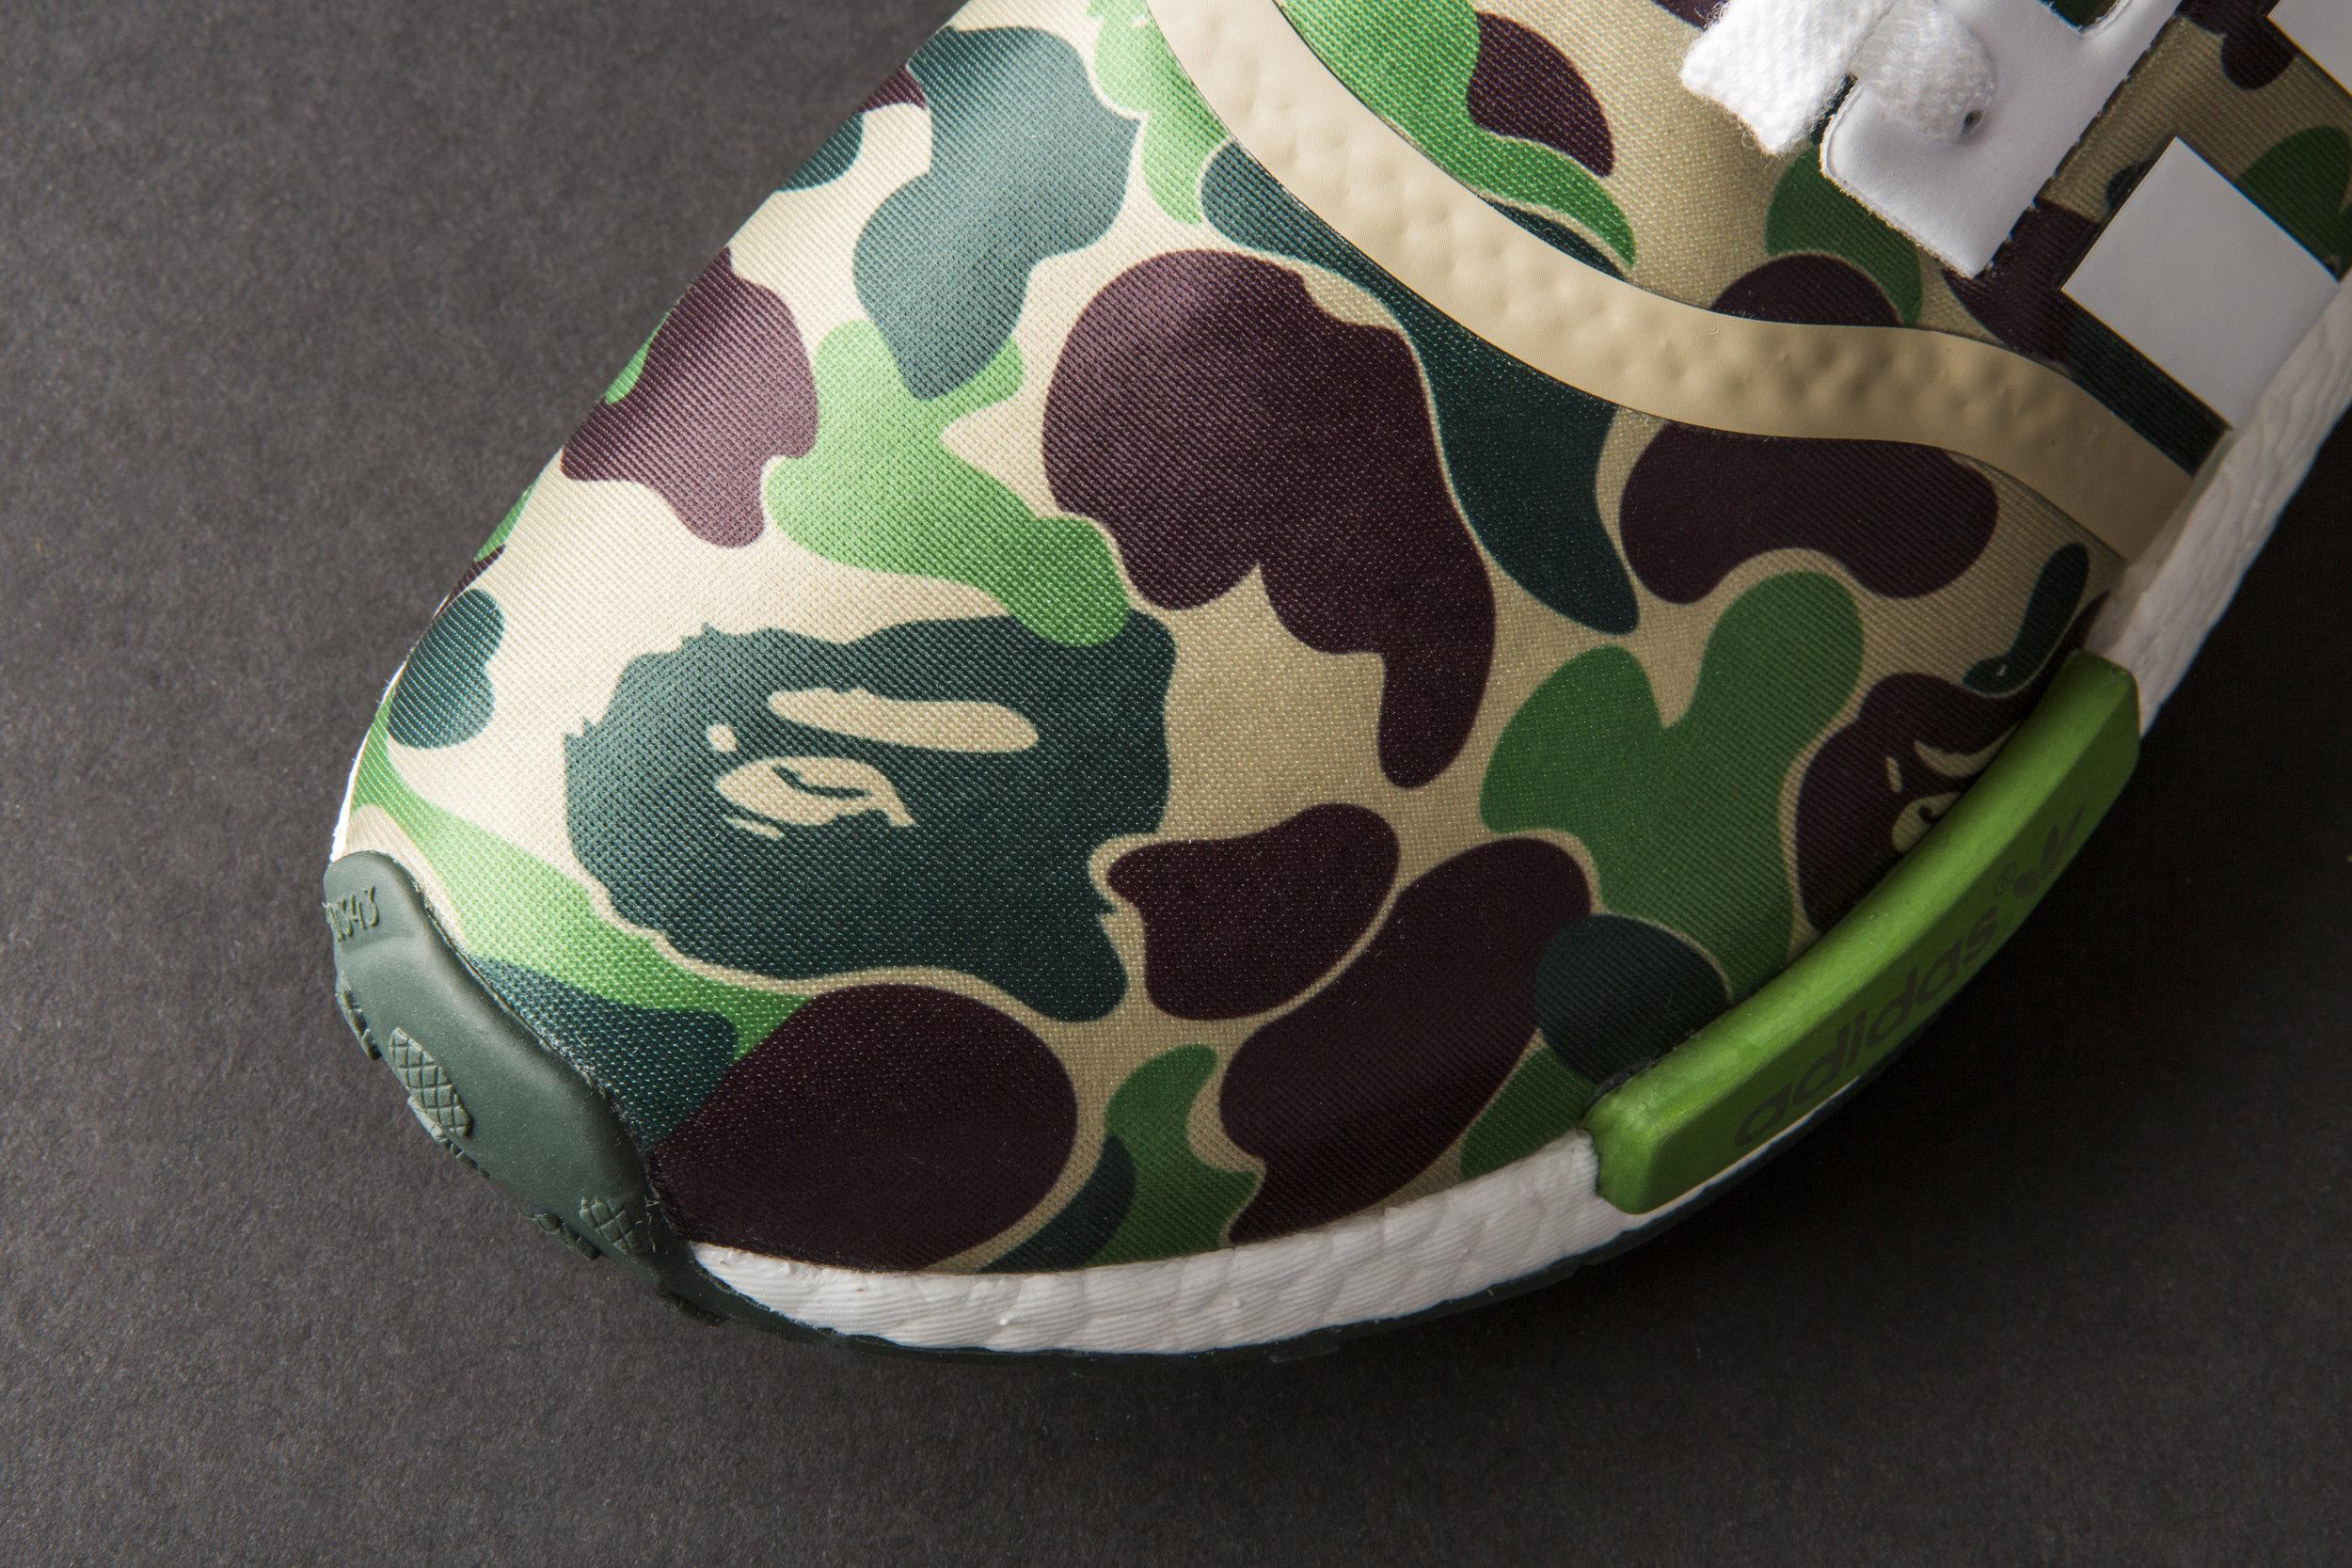 bape_adidas_nmd_stripe_center_14.jpg